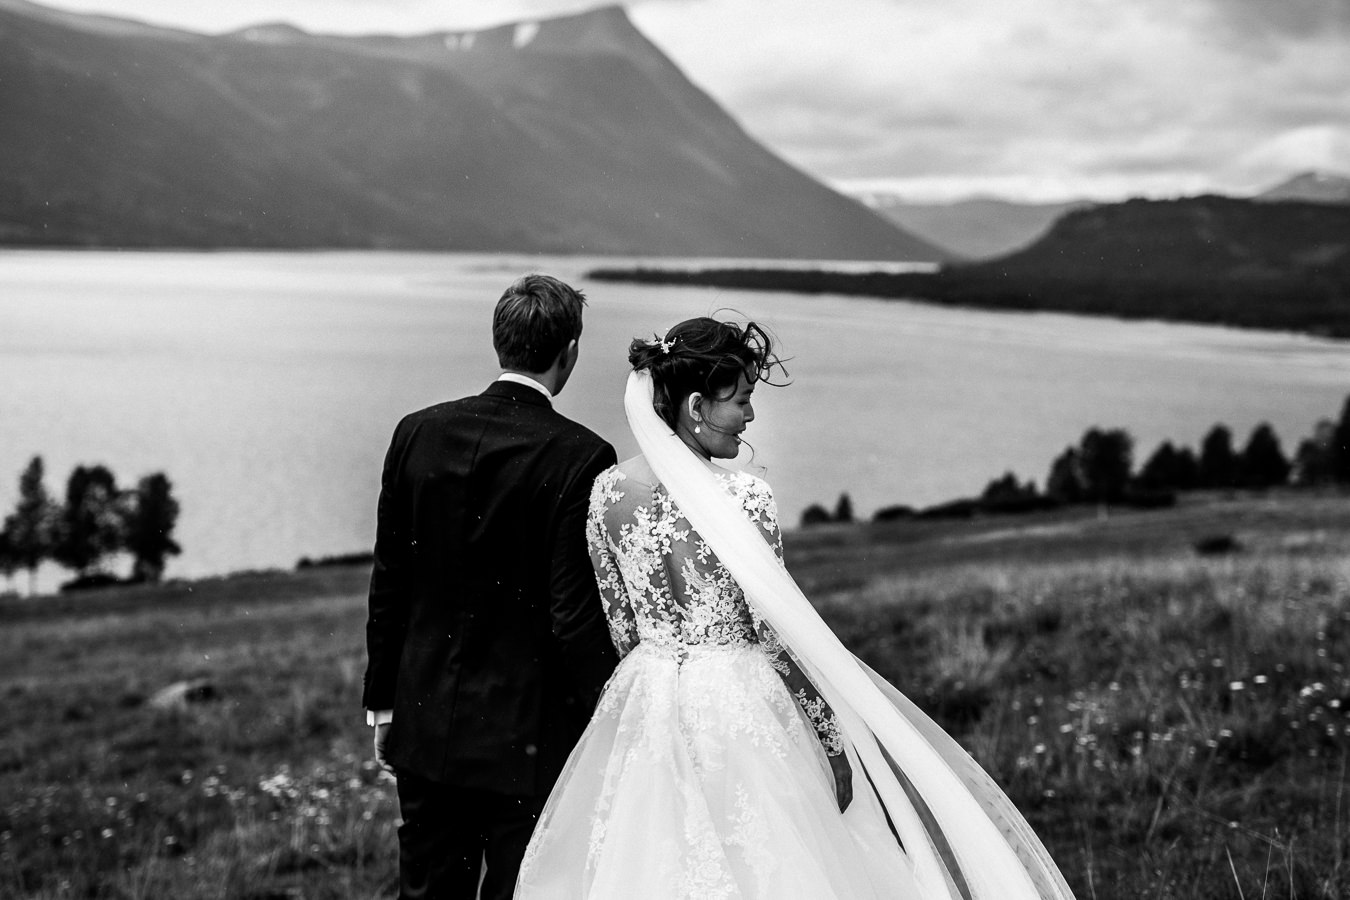 Fotograf-Tone-Tvedt-Natalie-Gunnar-188.jpg